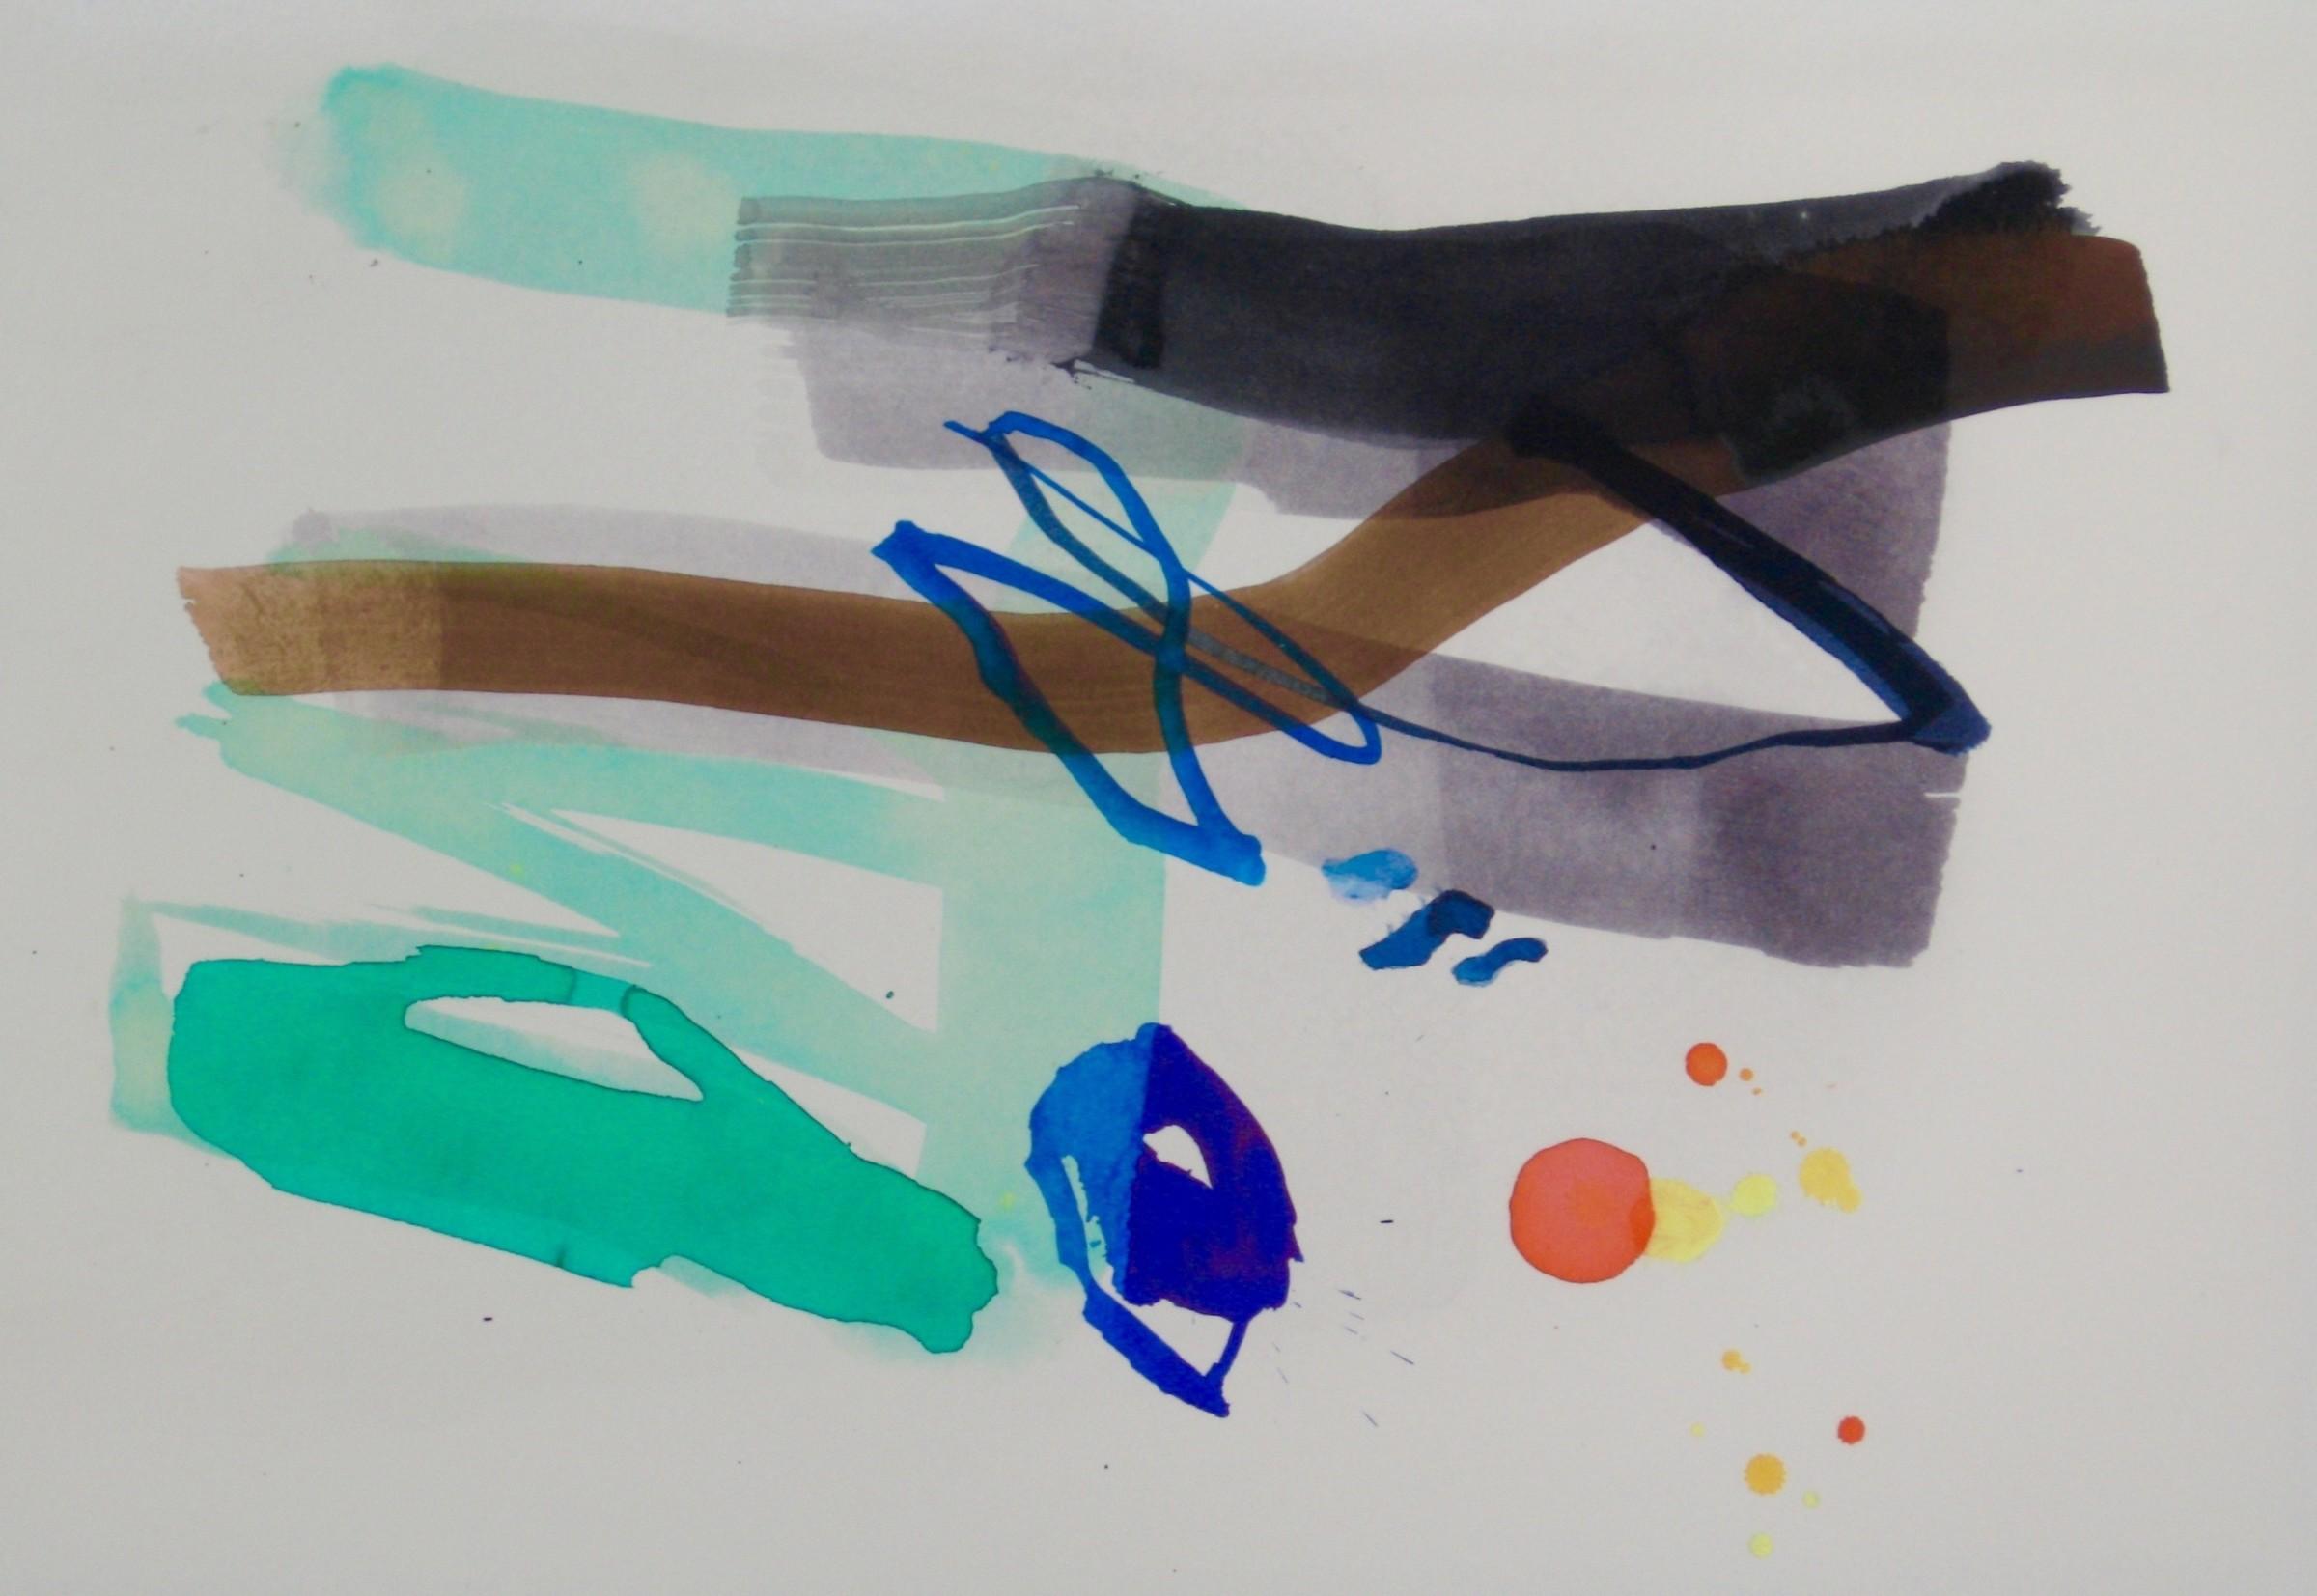 <span class=&#34;link fancybox-details-link&#34;><a href=&#34;/exhibitions/24/works/artworks_standalone10733/&#34;>View Detail Page</a></span><div class=&#34;artist&#34;><span class=&#34;artist&#34;><strong>Jane Lewis</strong></span></div><div class=&#34;title&#34;><em>Back from Seattle</em></div><div class=&#34;medium&#34;>ink</div><div class=&#34;dimensions&#34;>29x42cm</div>